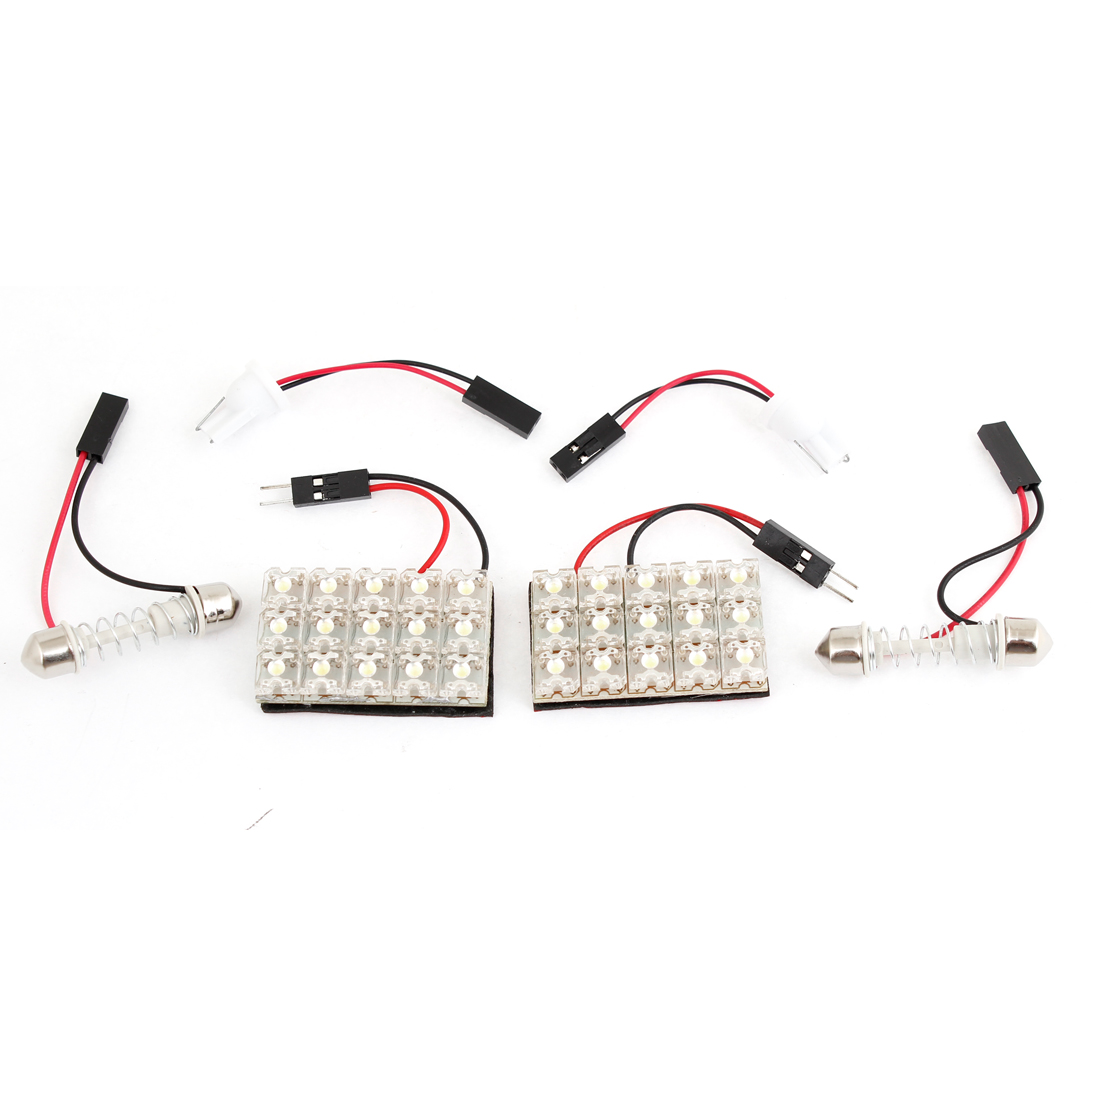 2 Pcs Festoon Base T10 Adaper w 15 White LED Dome Roof Light for Car